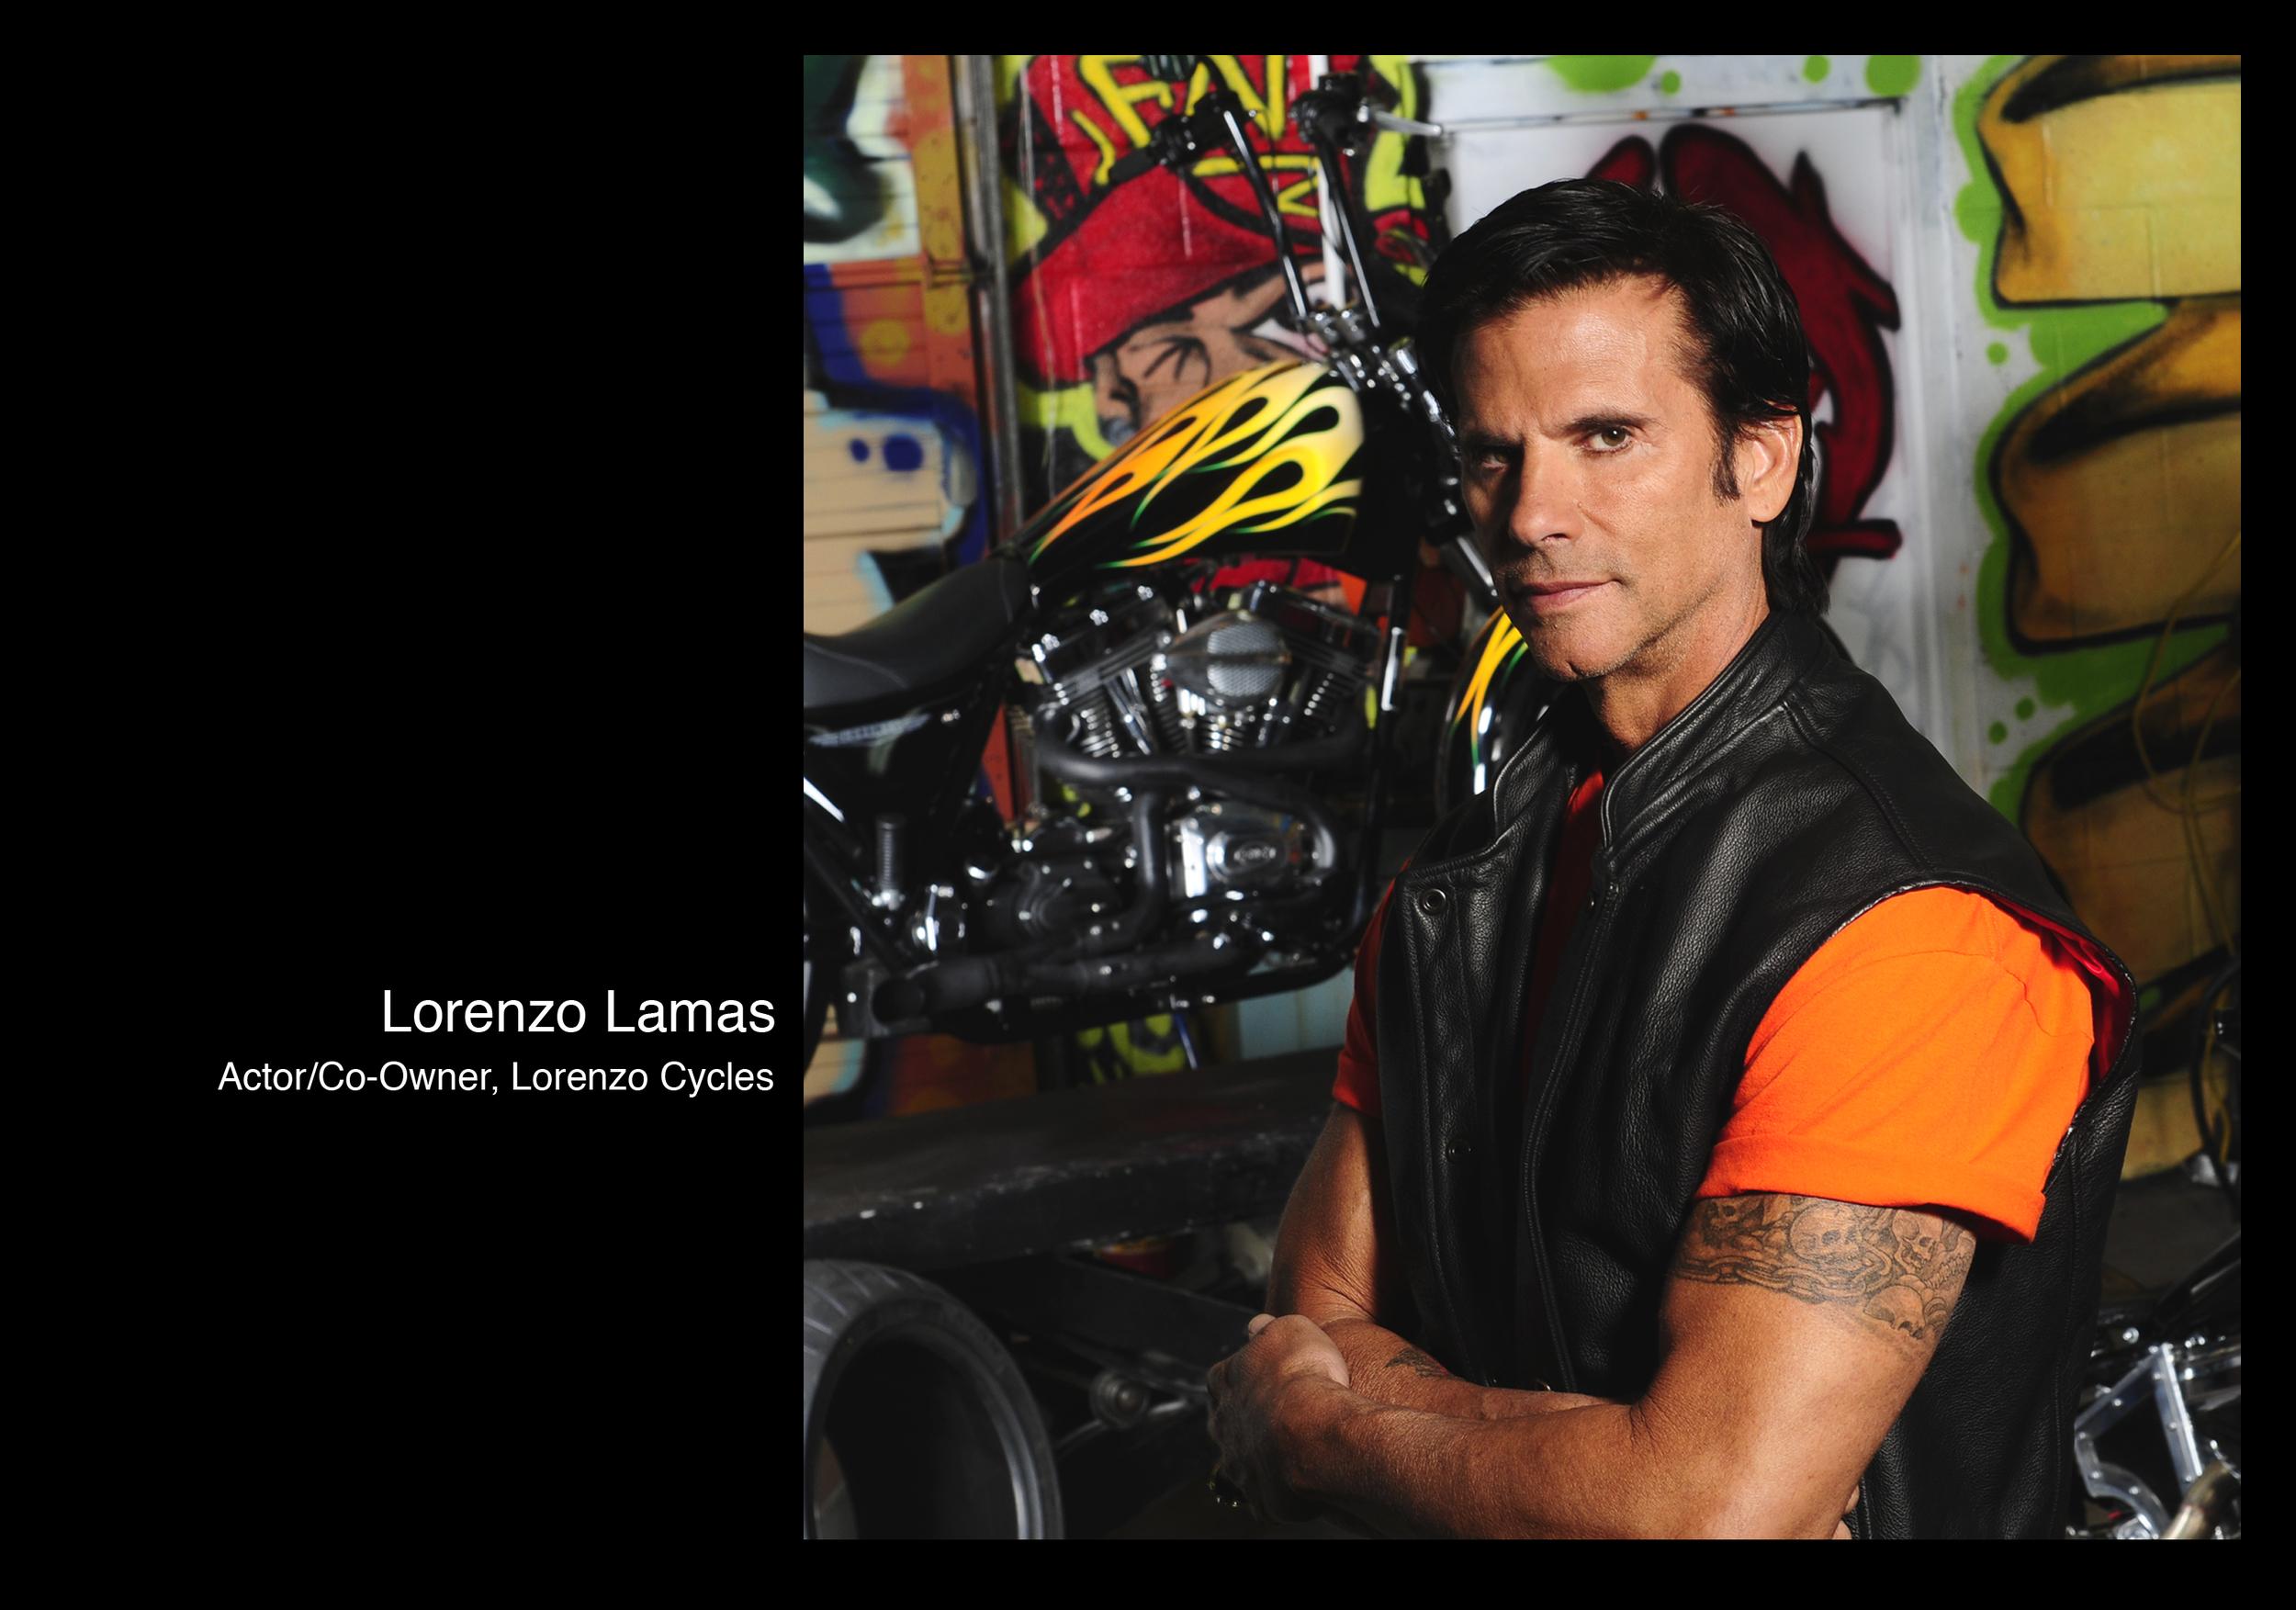 Lorenzo Lamas - Actor